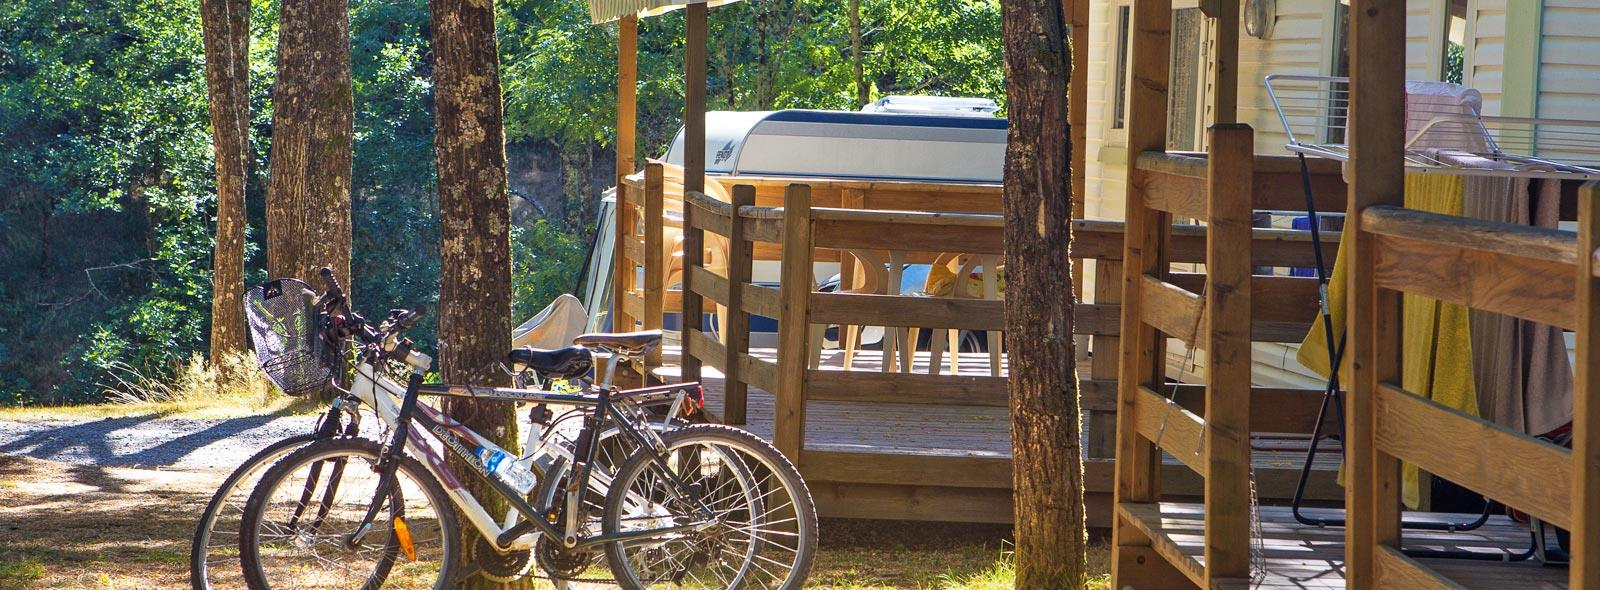 Camping le Roubreau, Joannas, Ardèche